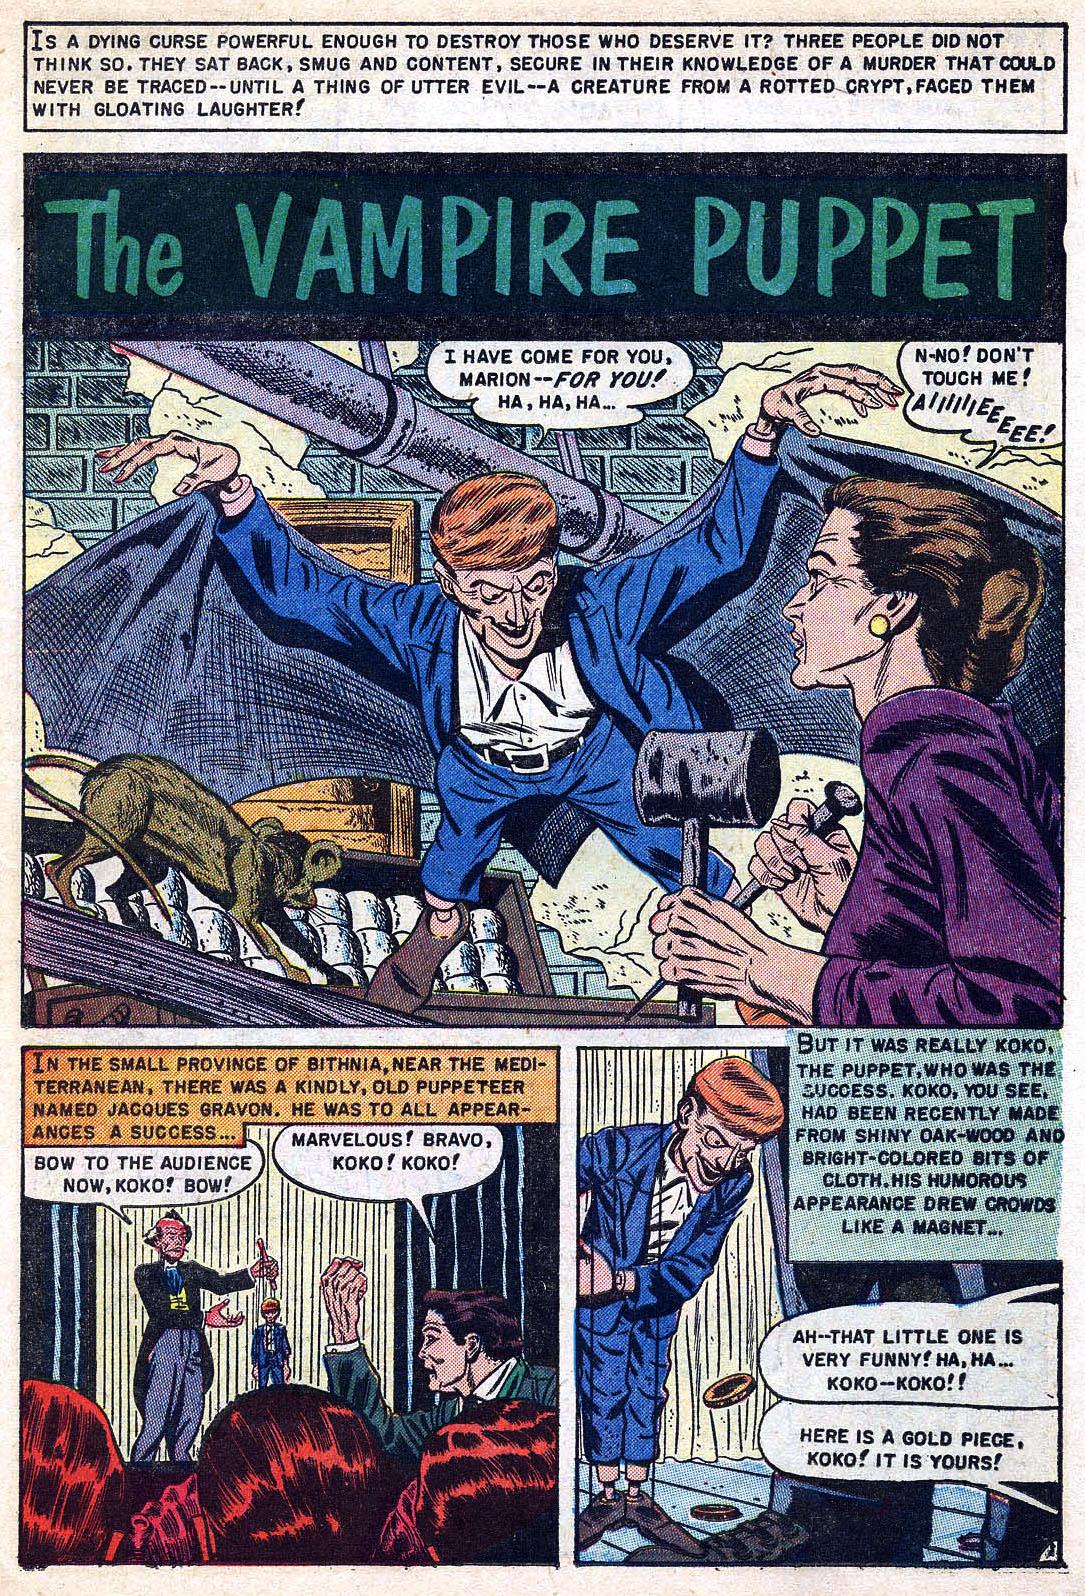 VampirePuppet1